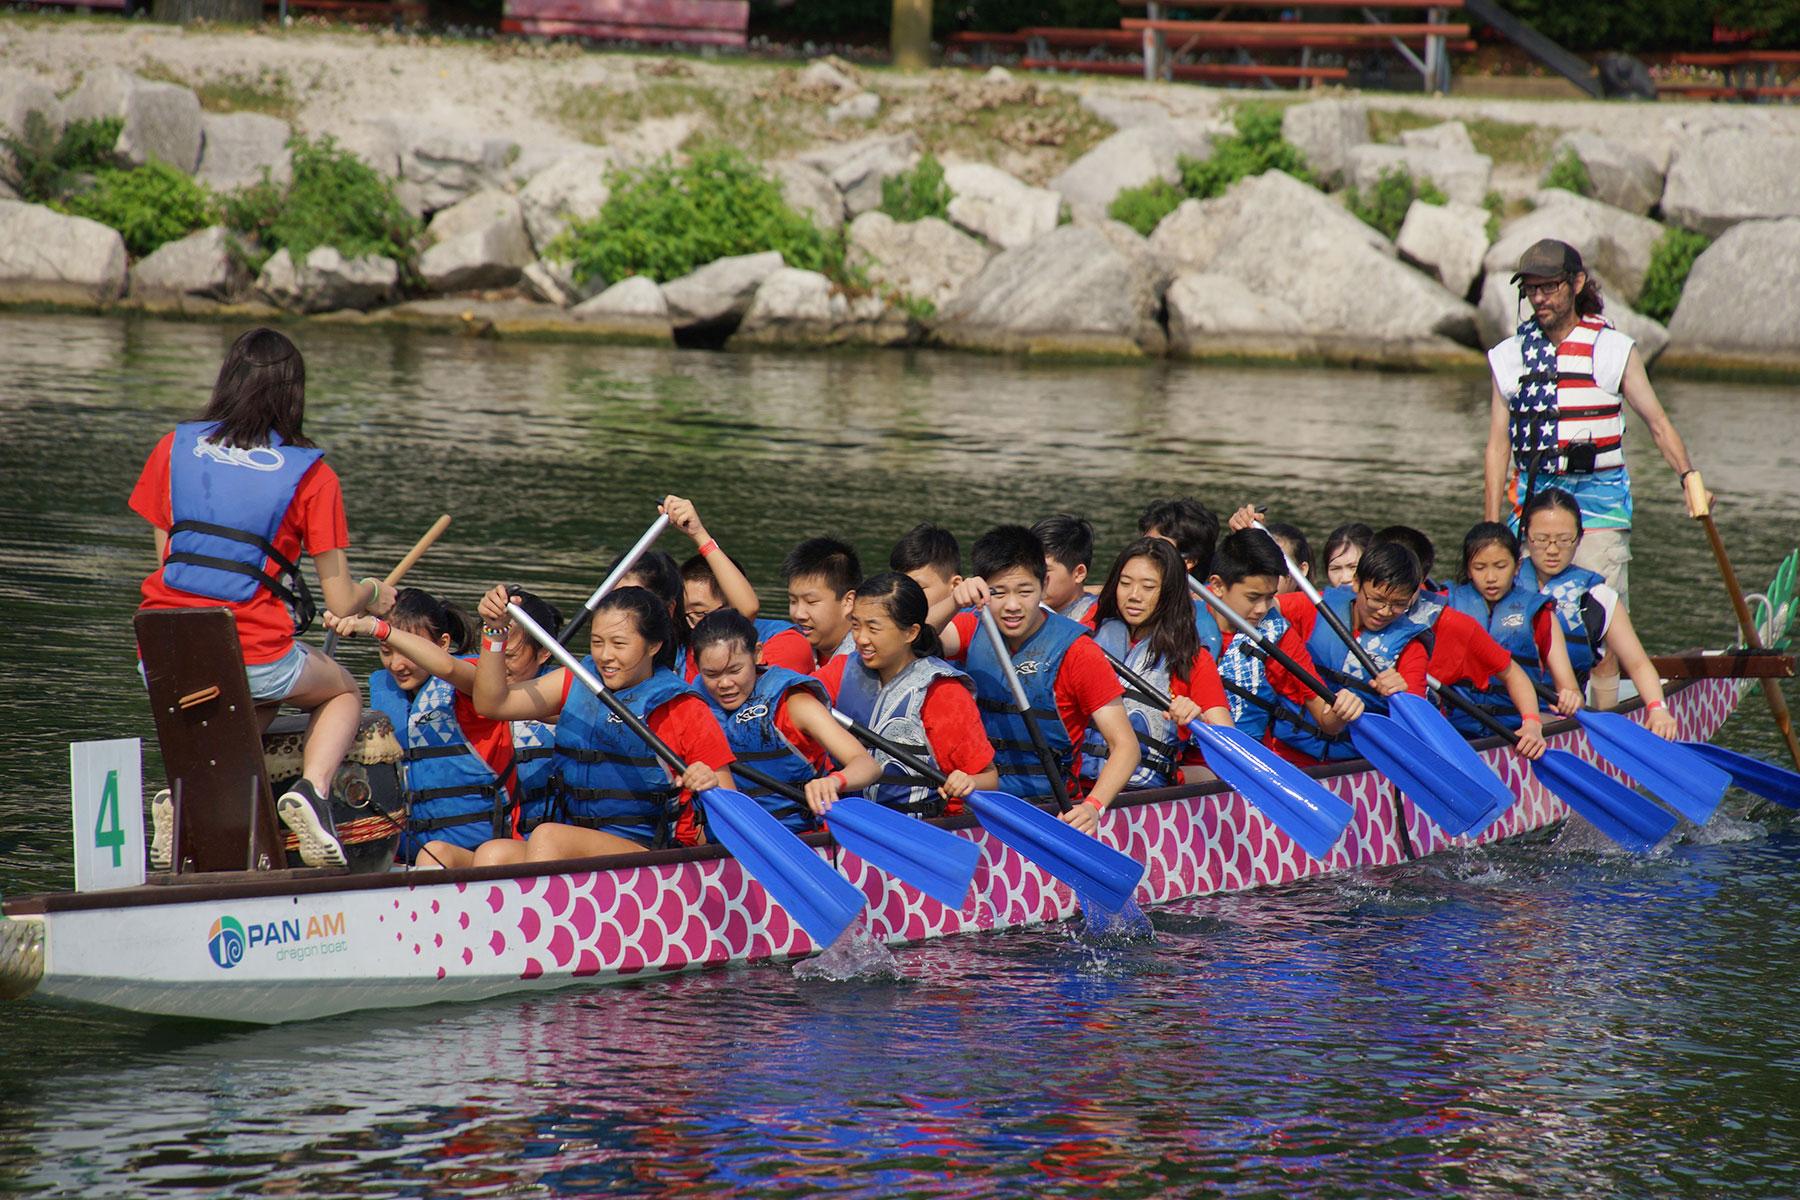 081118_dragonboat_528